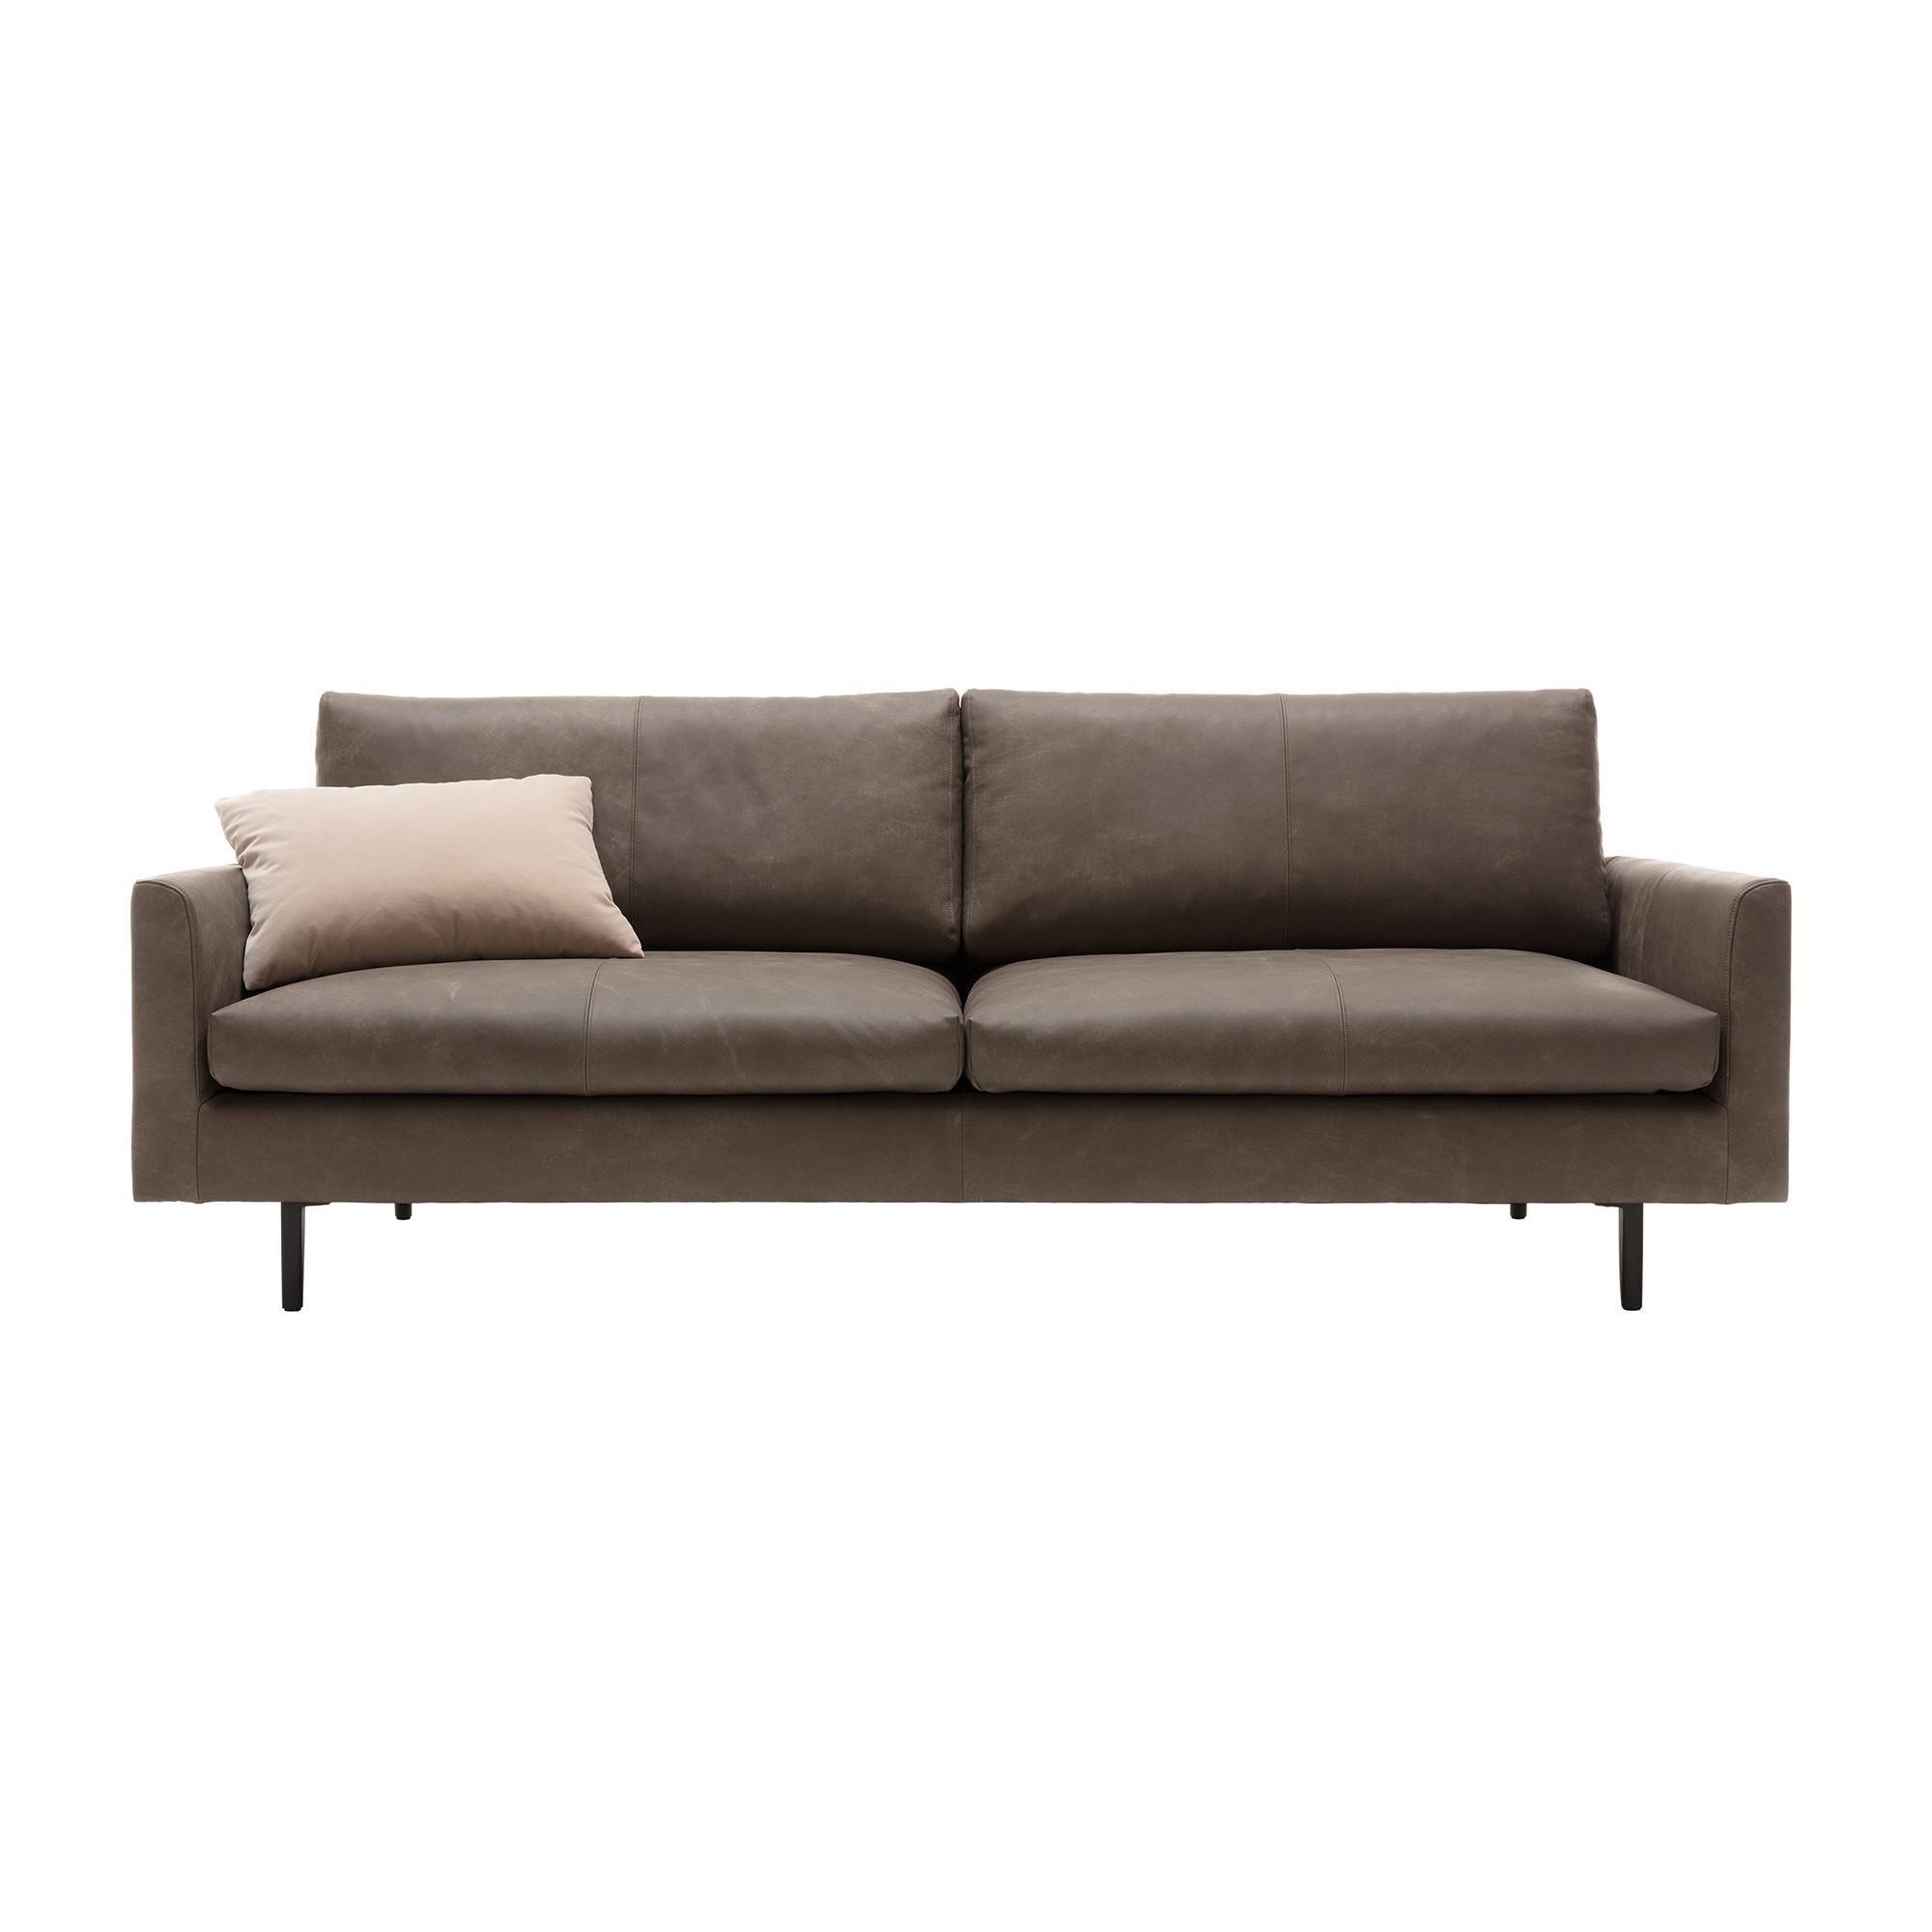 Freistil Rolf Benz Freistil 134 2 Seater Sofa Ambientedirect